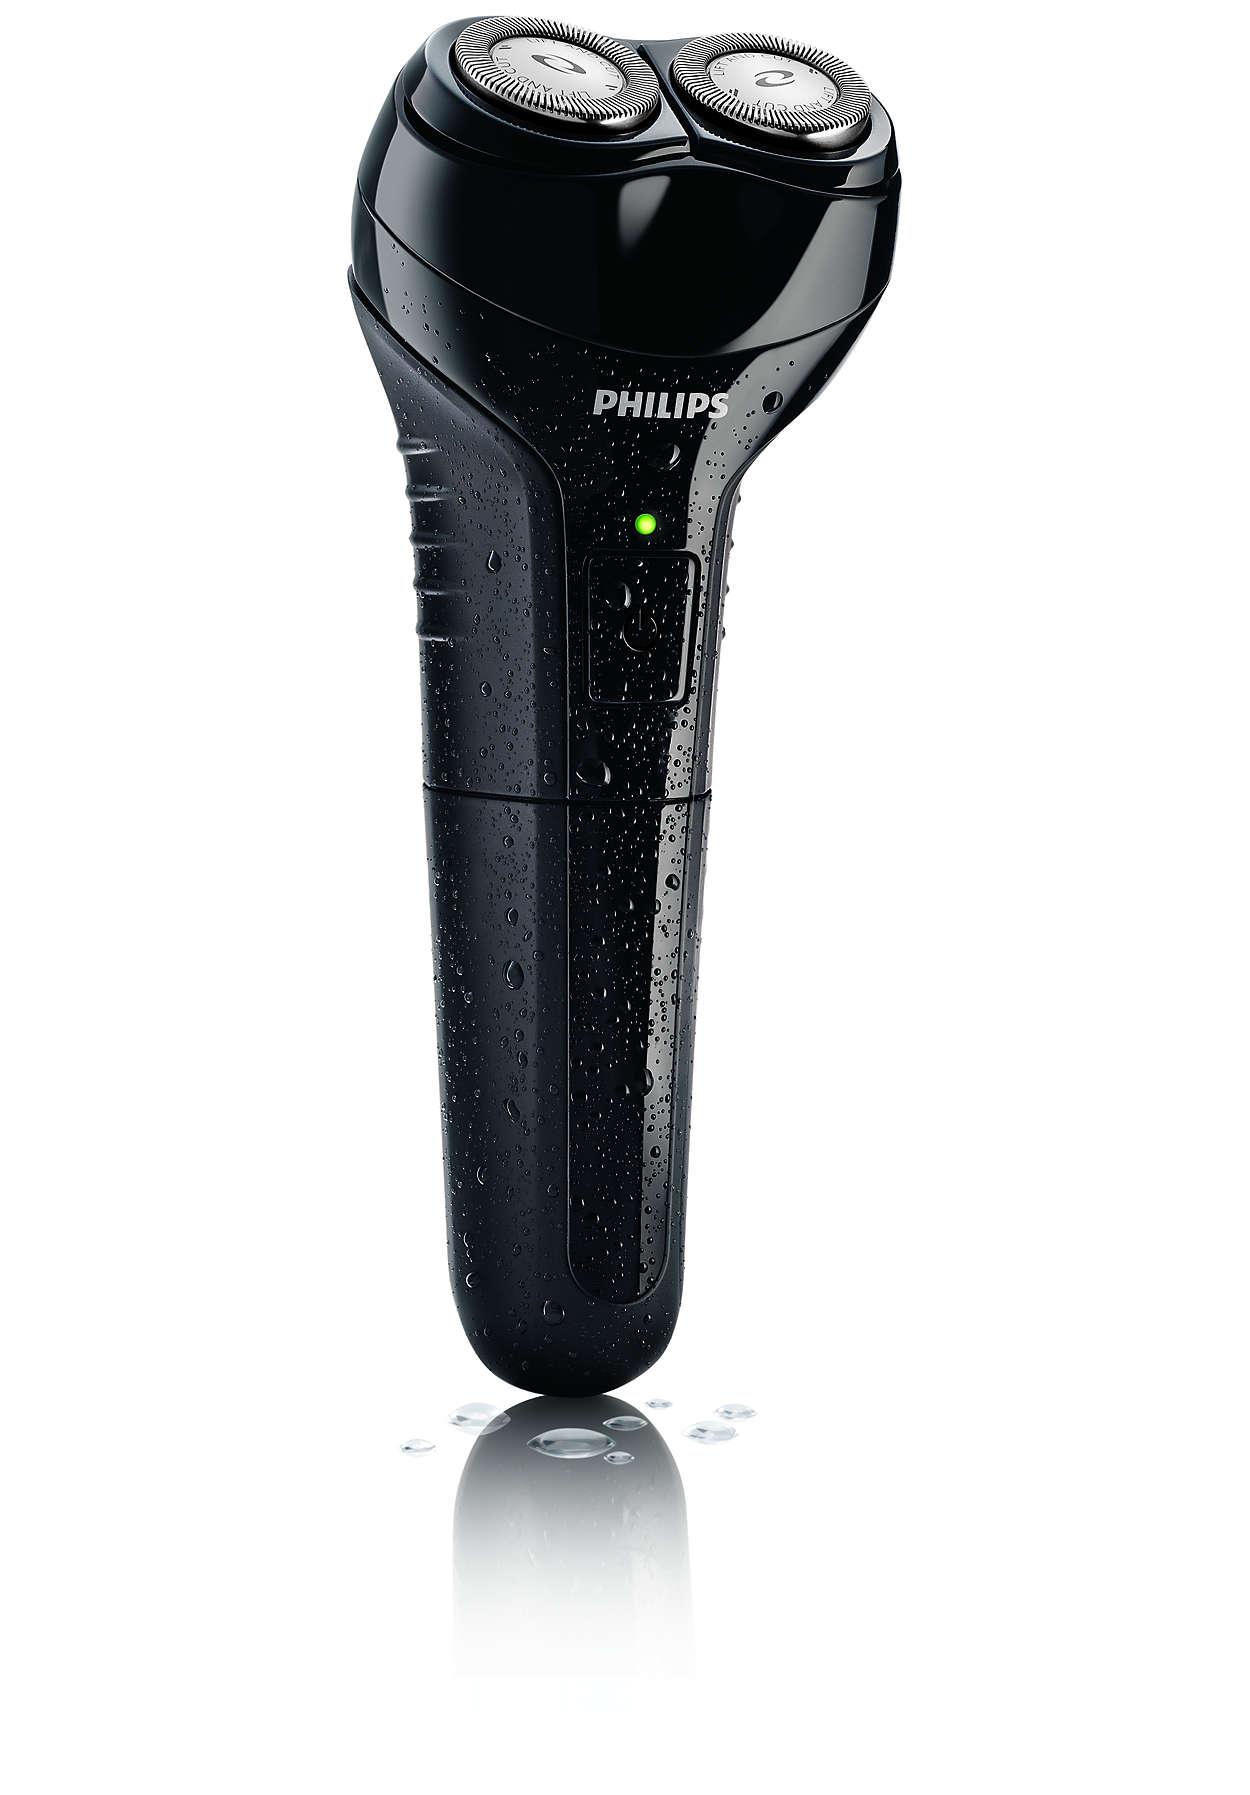 Barbeador elétrico Philips HQ912